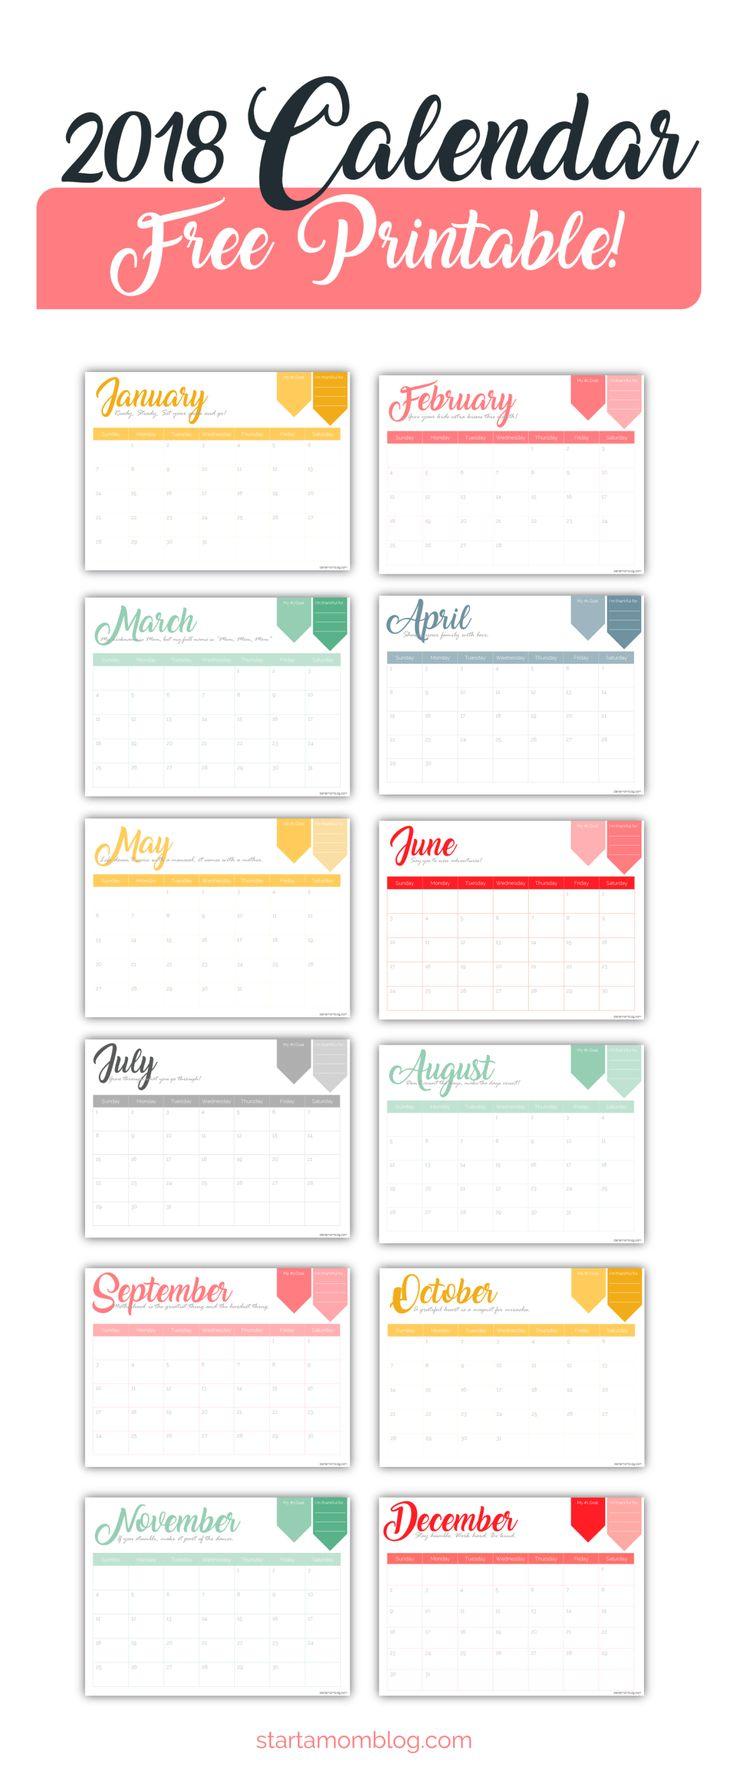 2018 Calendar Template Free Printable - Start a Mom Blog